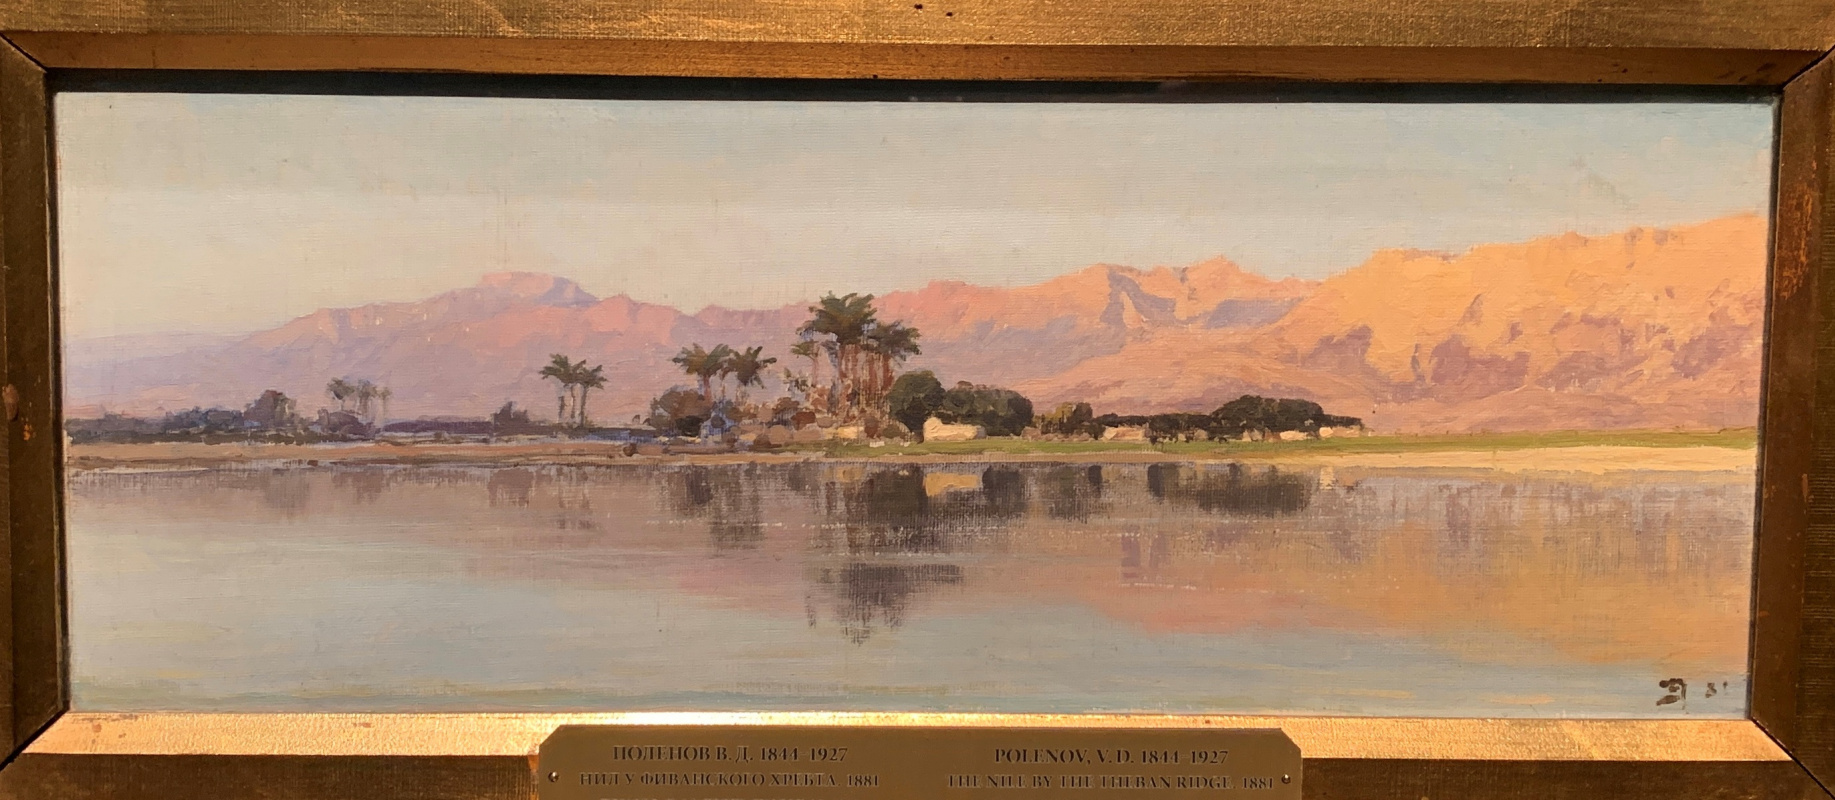 Vasily Polenov. Nile at the Theban Range